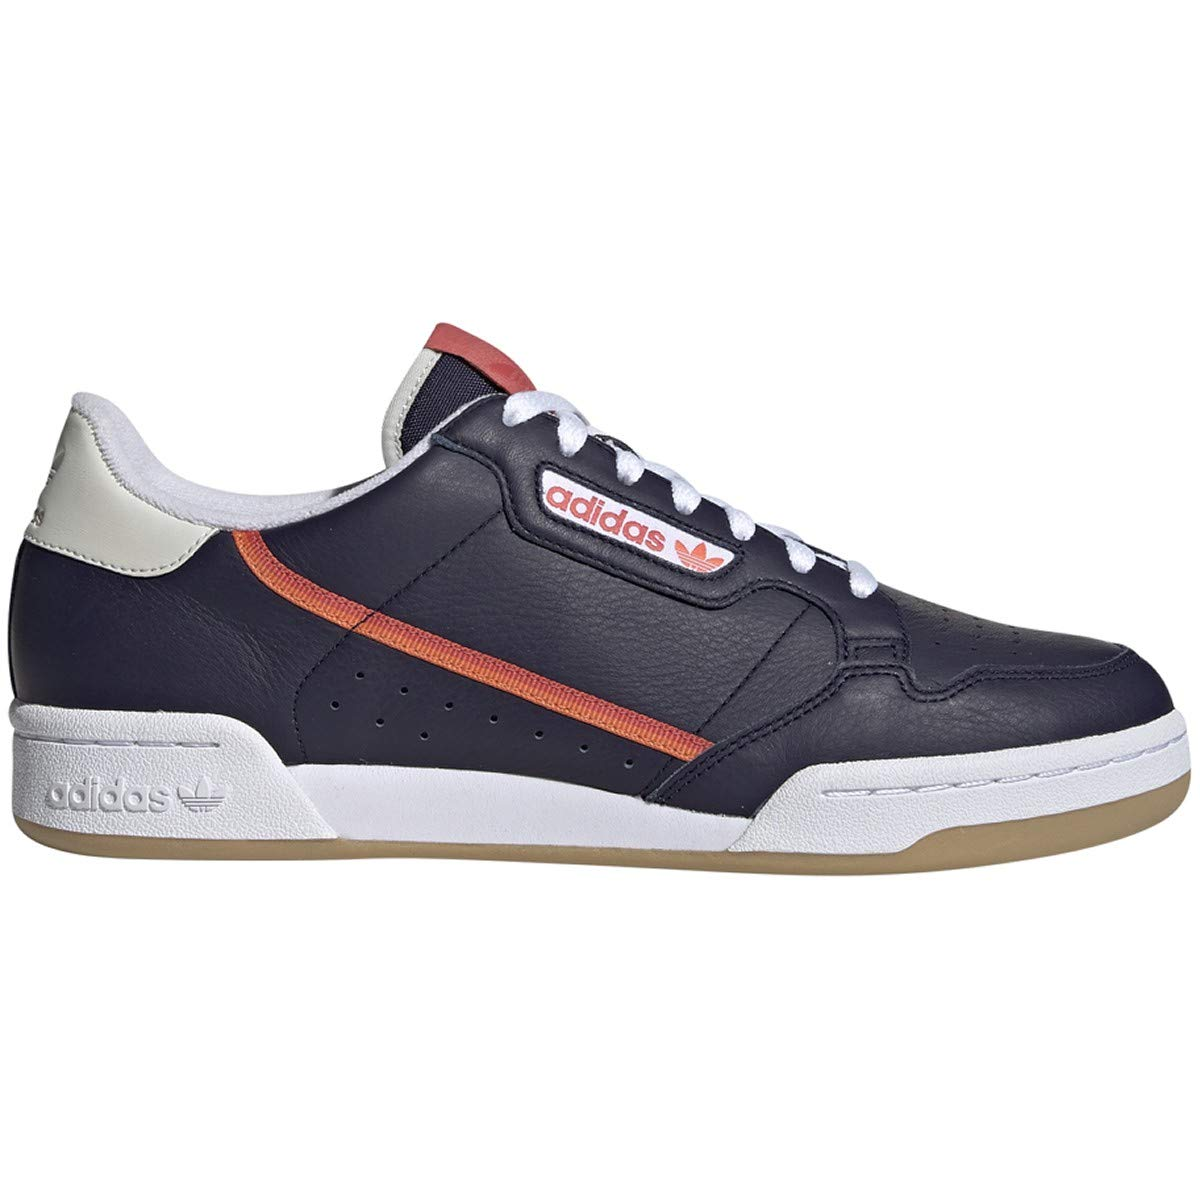 sale retailer 522e6 203cc Amazon.com   adidas Continental 80 Mens Fashion-Sneakers BD7797   Fashion  Sneakers